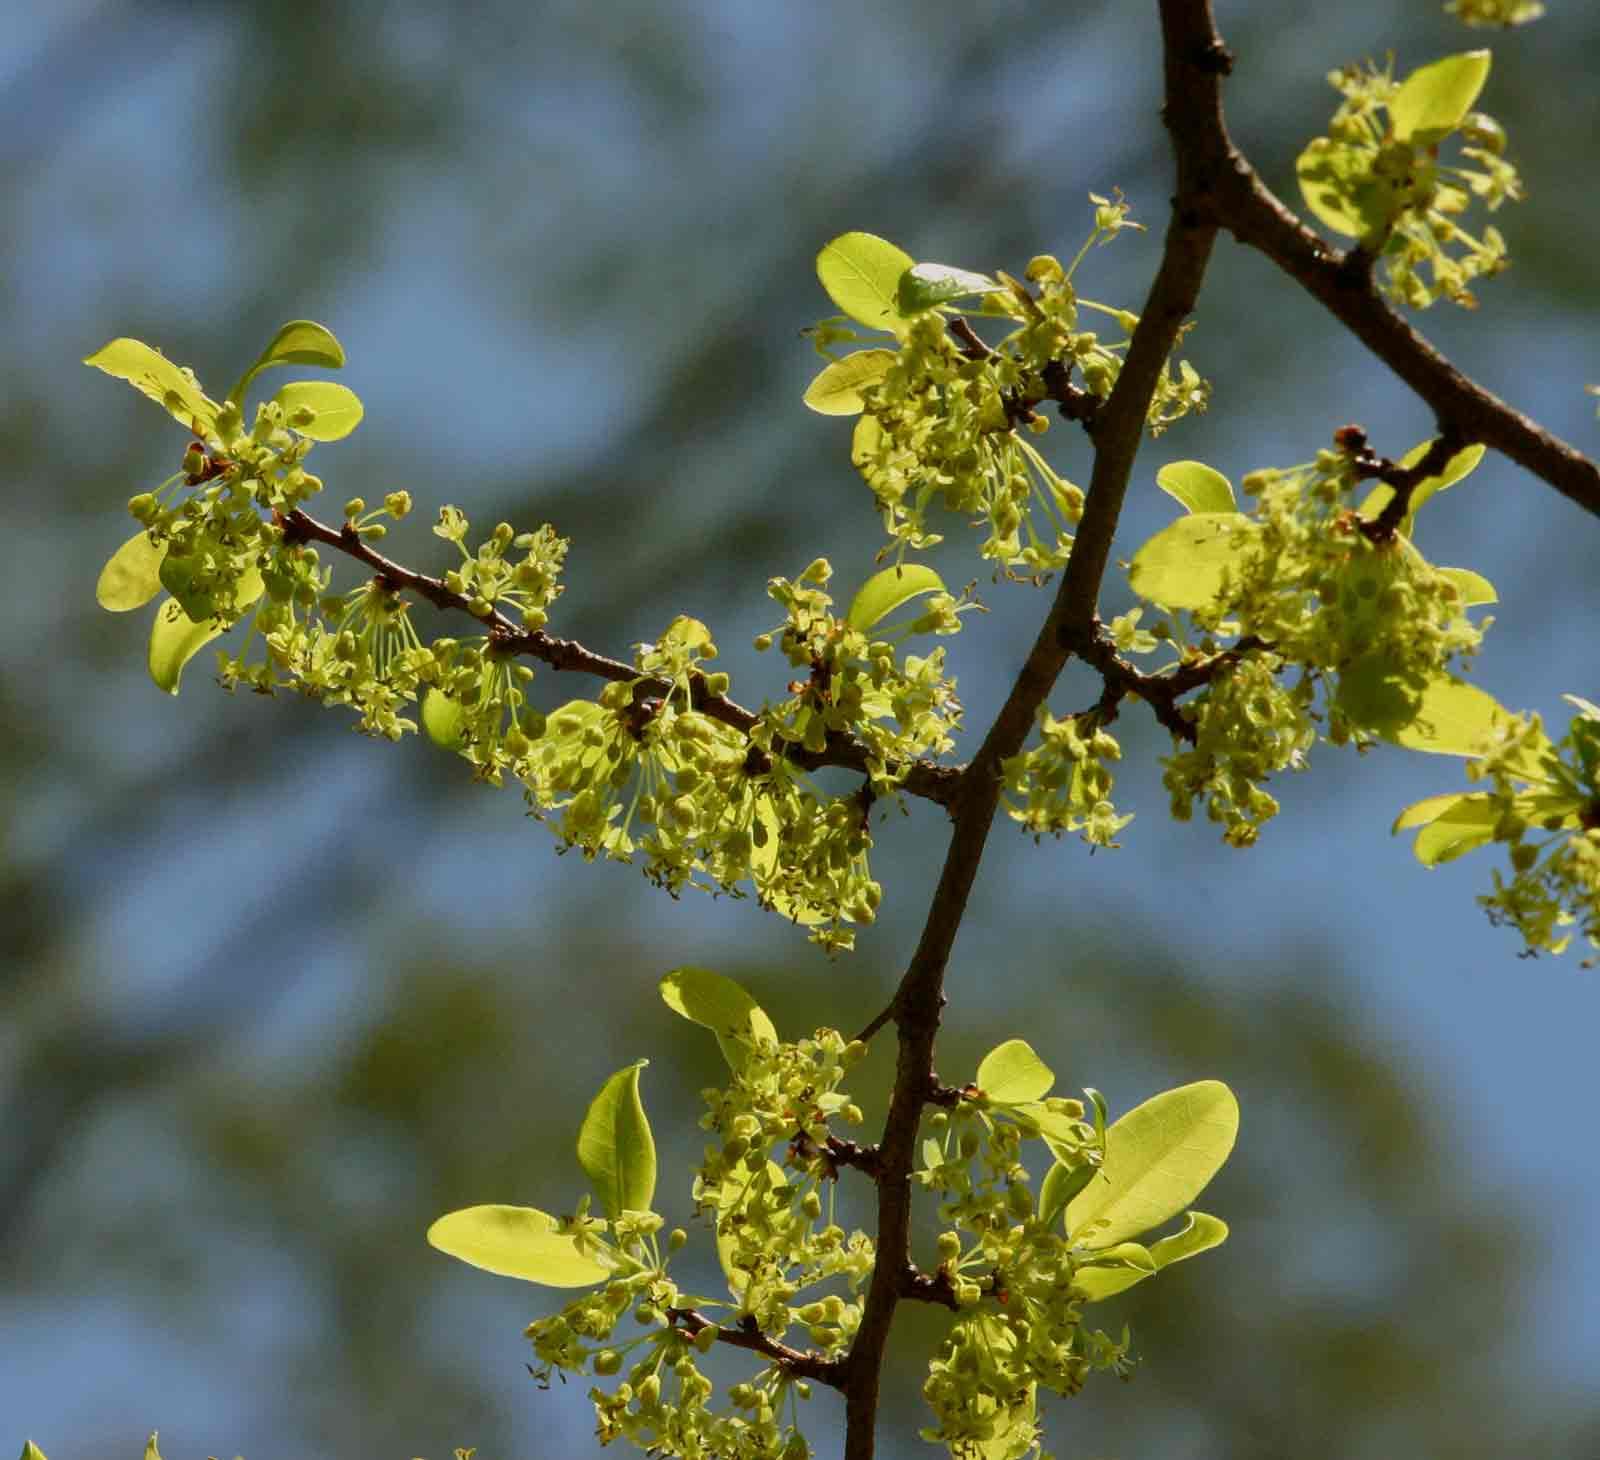 Margaritaria discoidea var. nitida